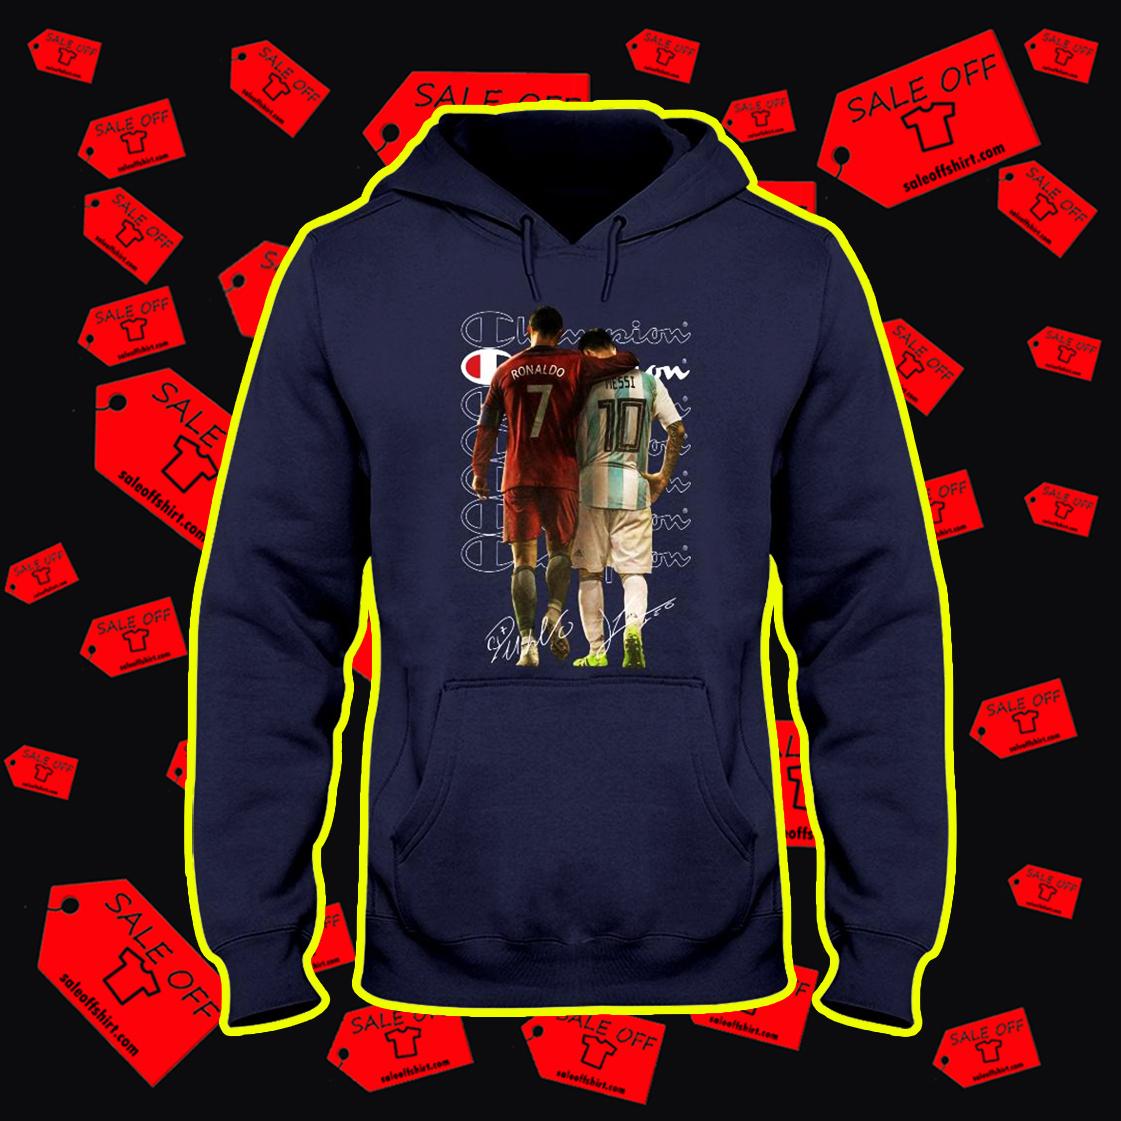 Ronaldo Messi Champion Signature hooded sweatshirt